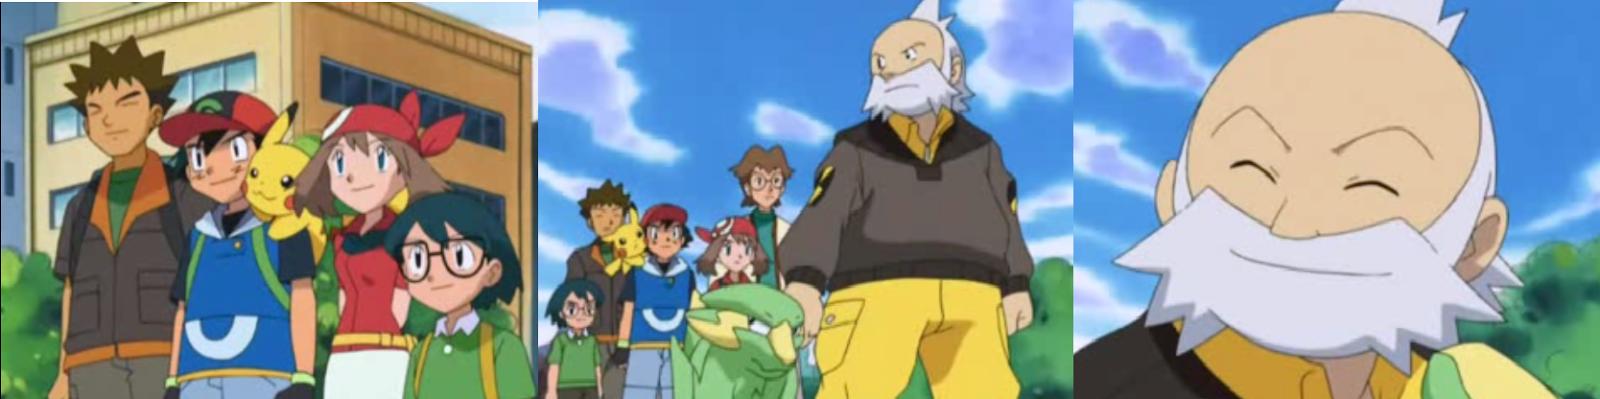 Pokemon Capitulo 40 Temporada 6 Wattson Y Watt